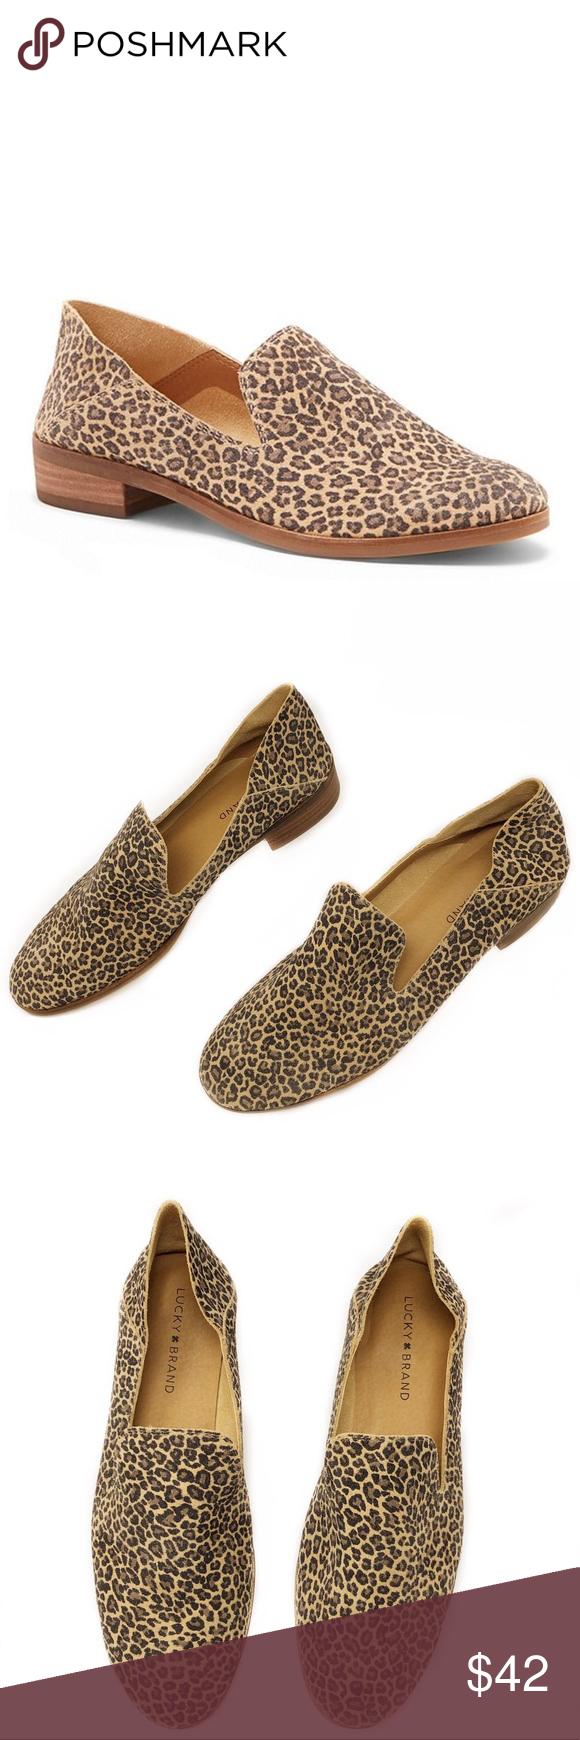 lucky brand cahill leopard